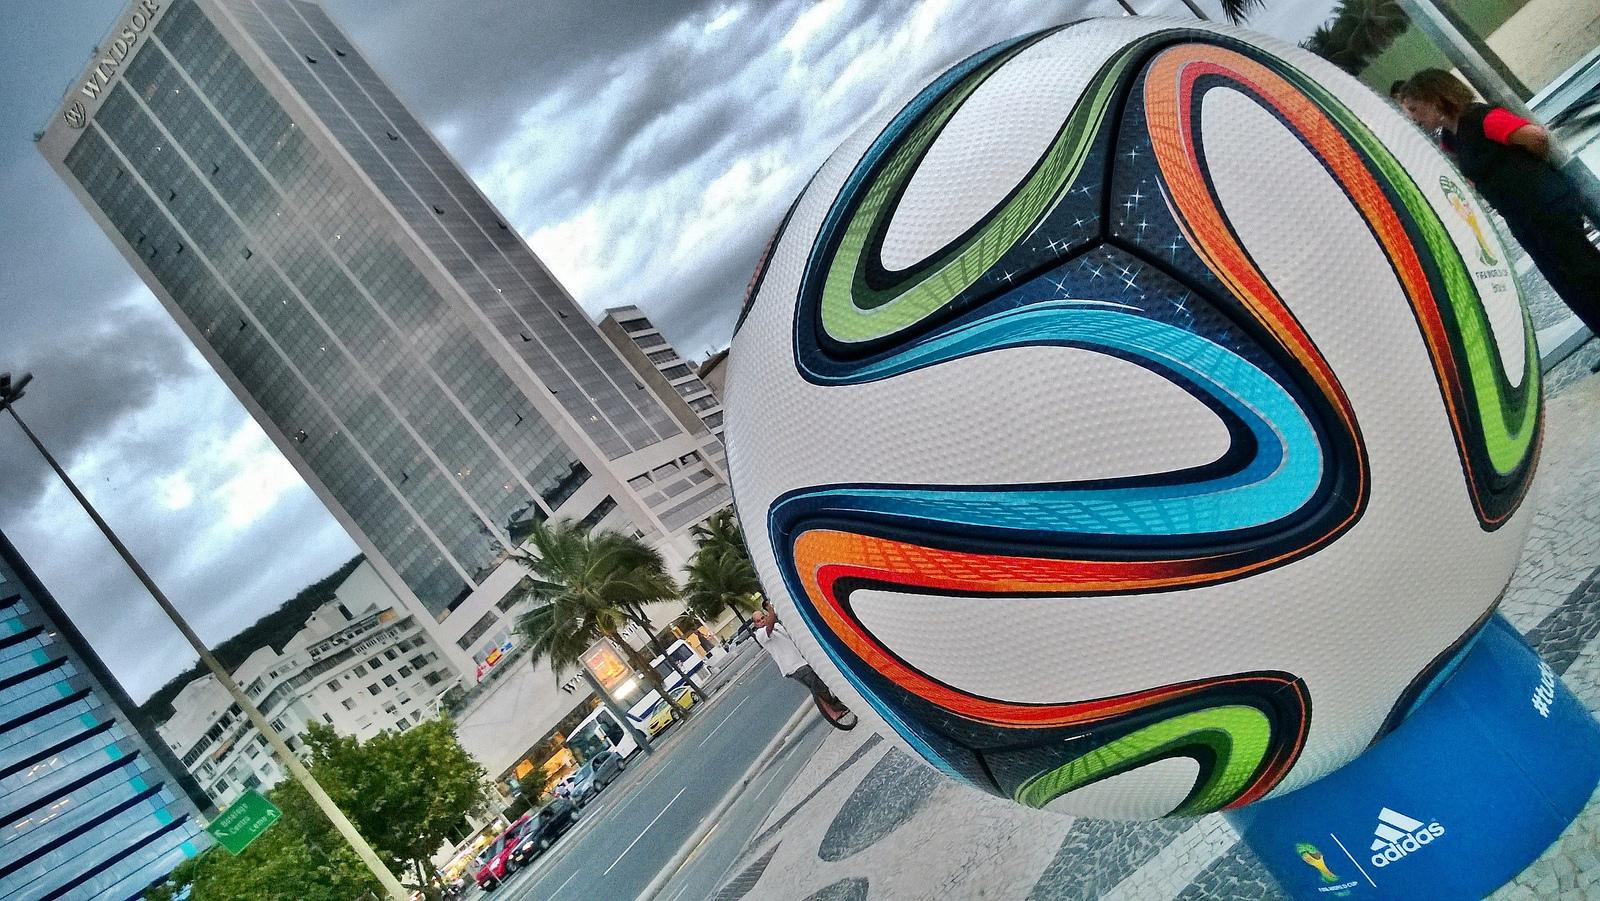 Pelota del Mundial 2014 - 1600x901